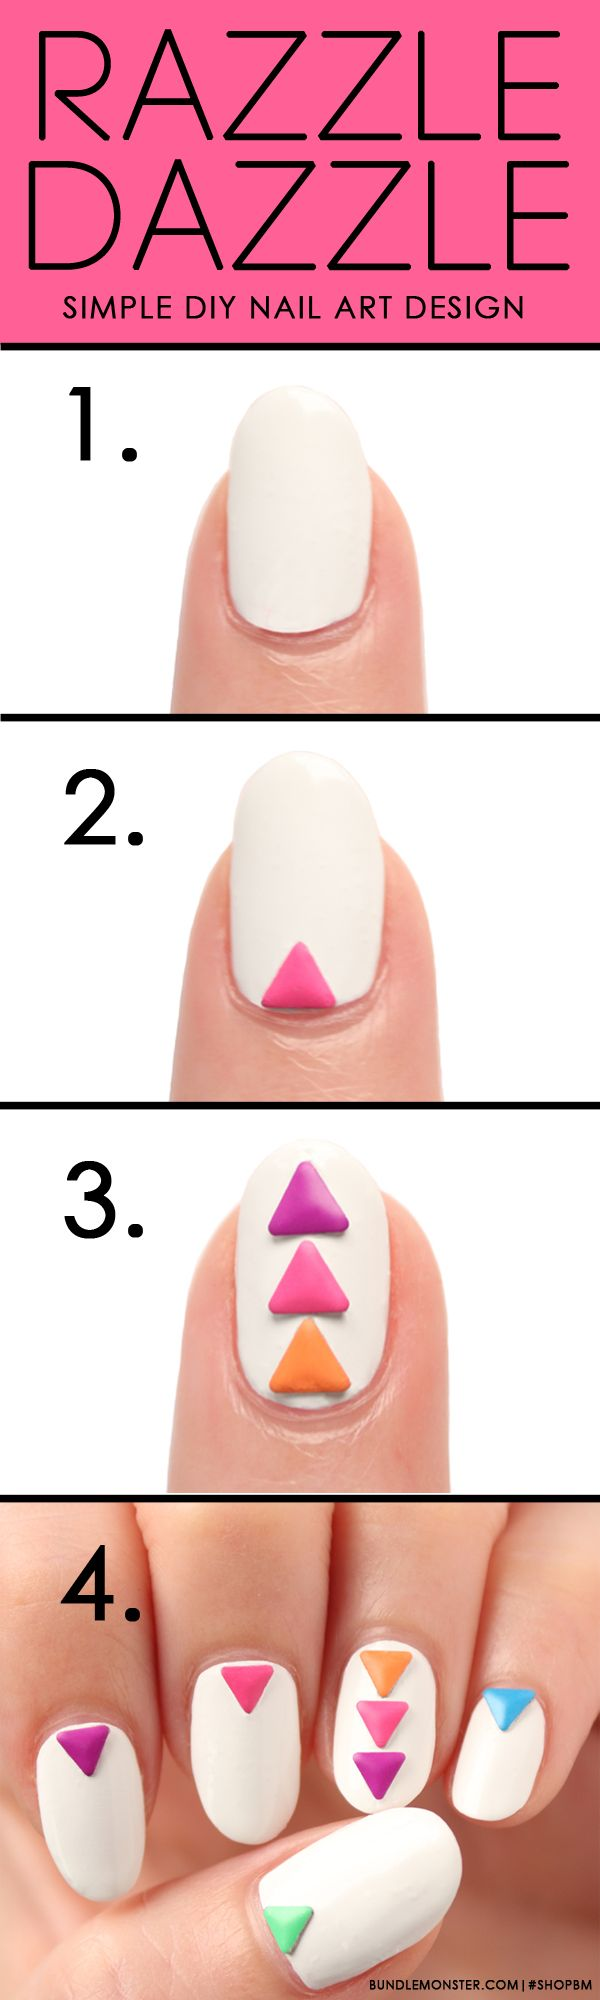 163 best Nail Art Techniques images on Pinterest | Nail art ...